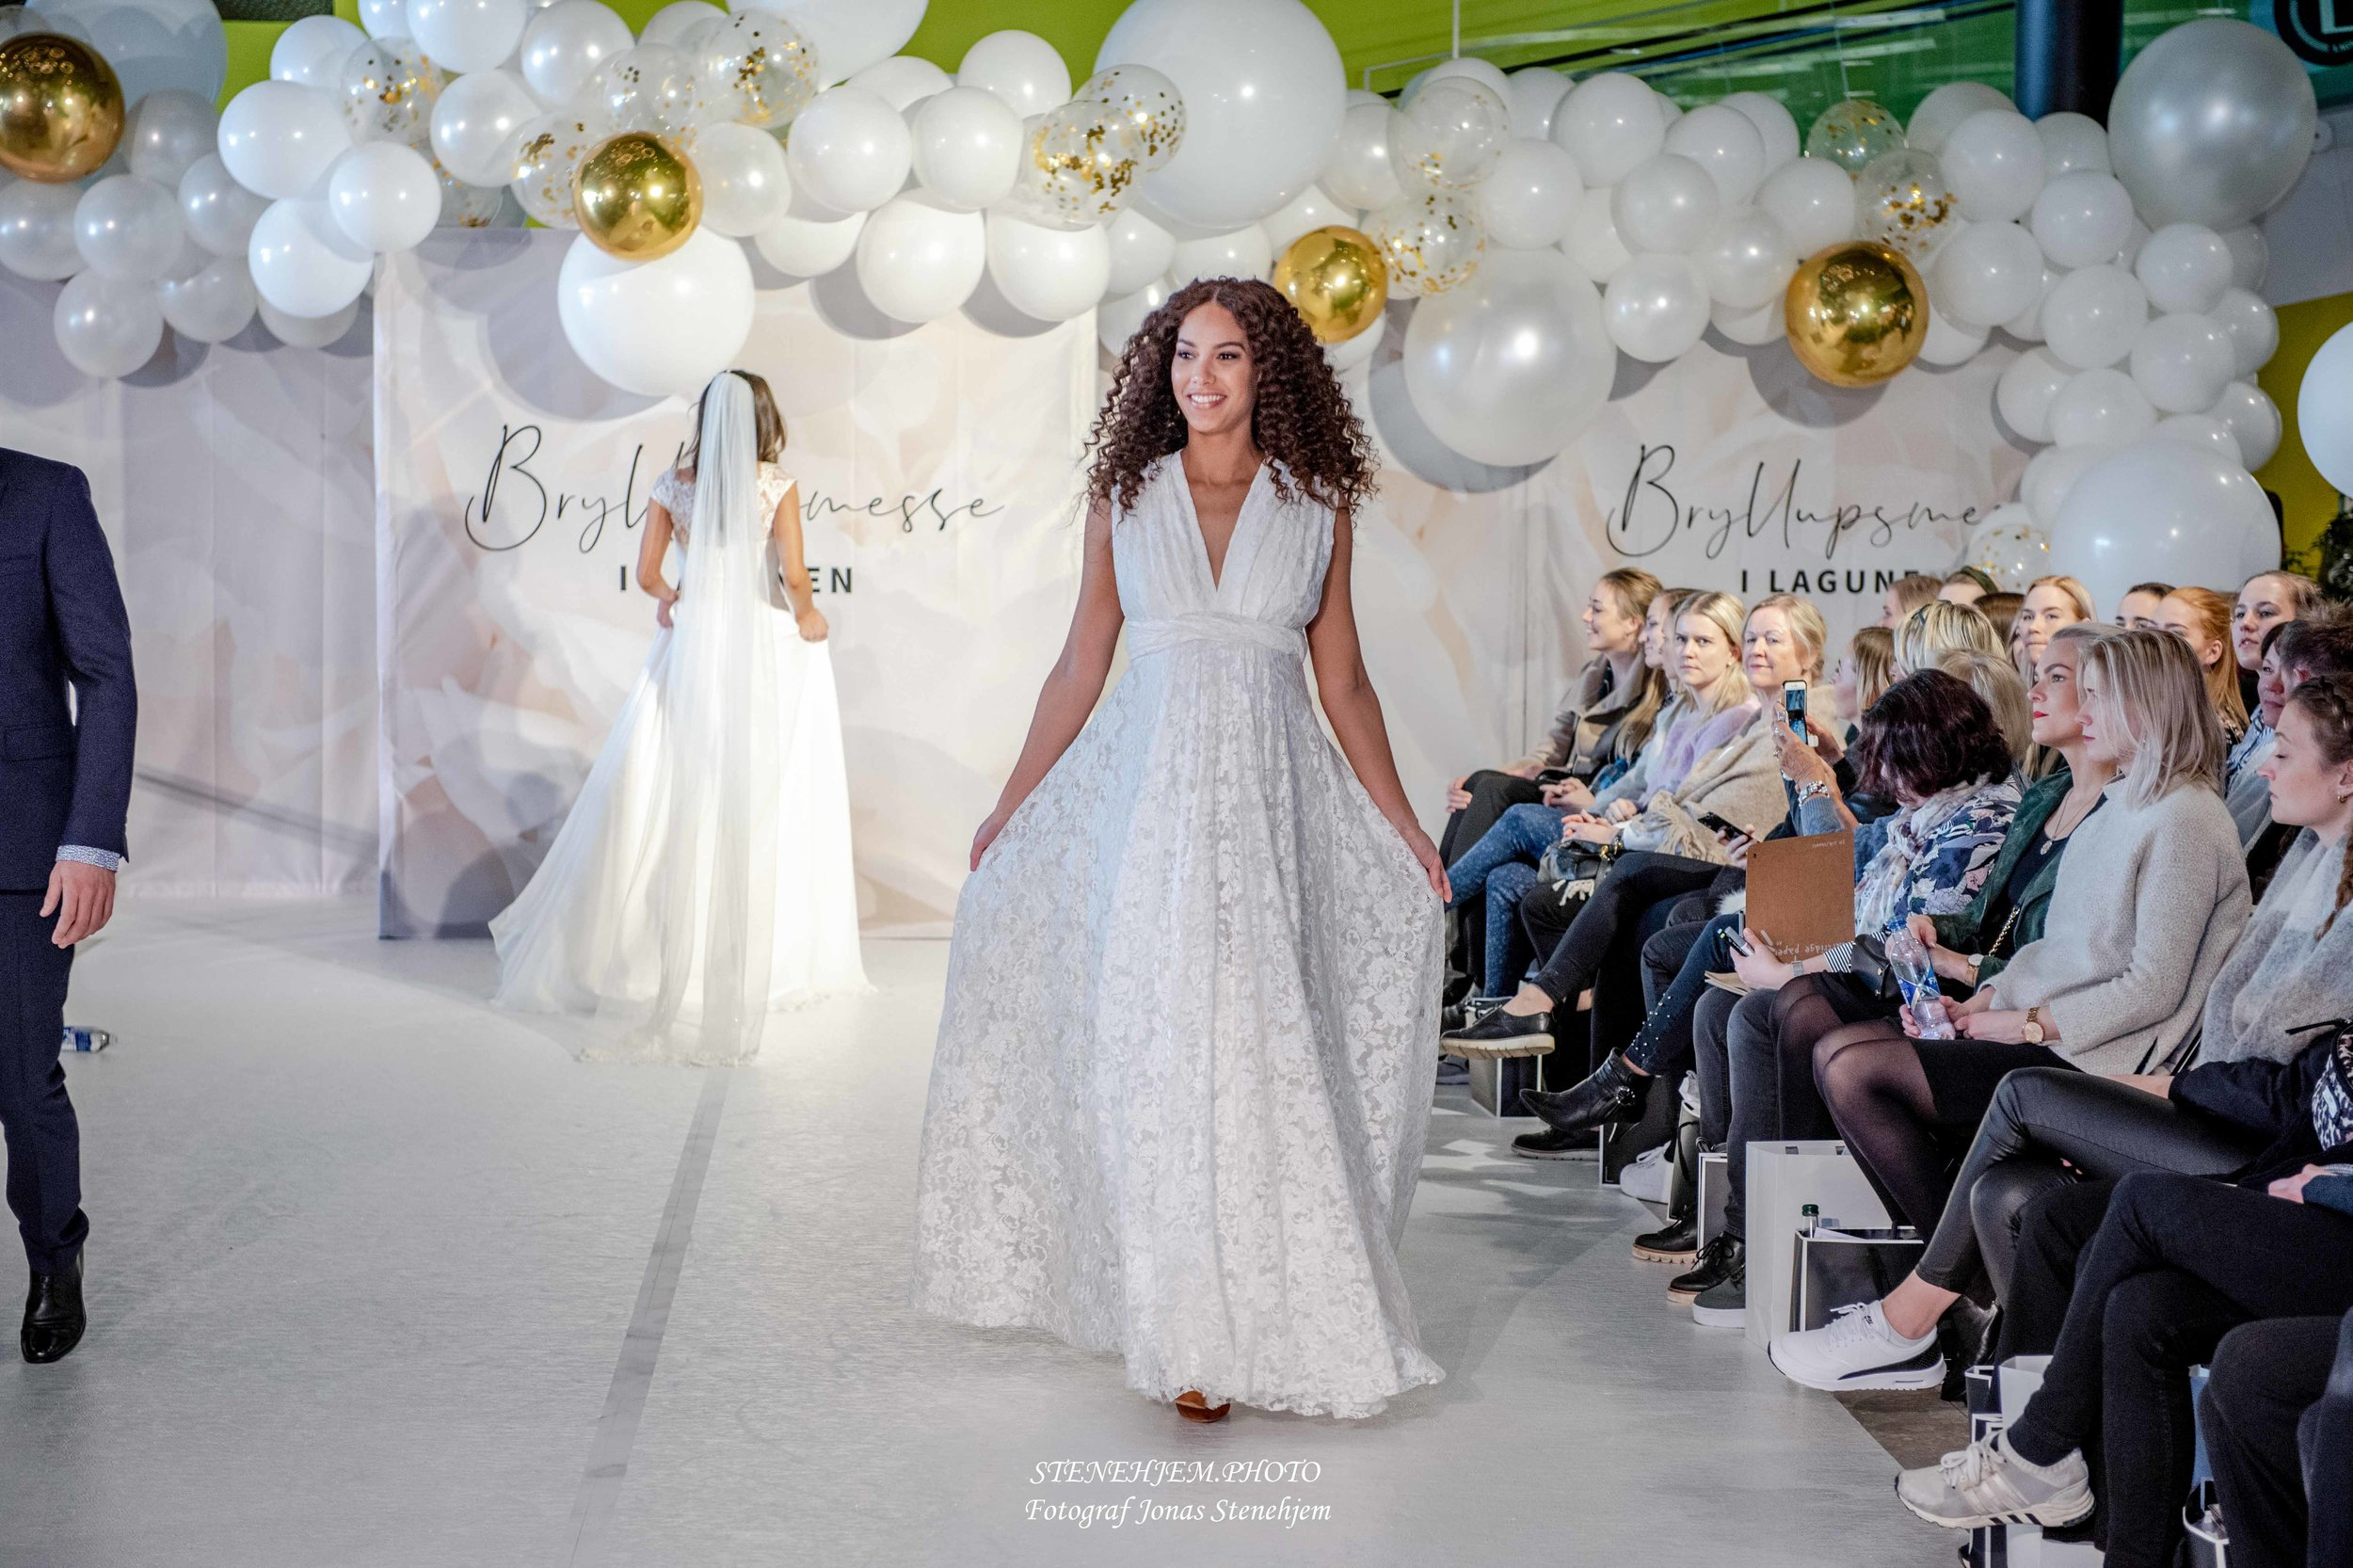 Bryllupsmesse_Lagunen_mittaltweddingfair__045.jpg